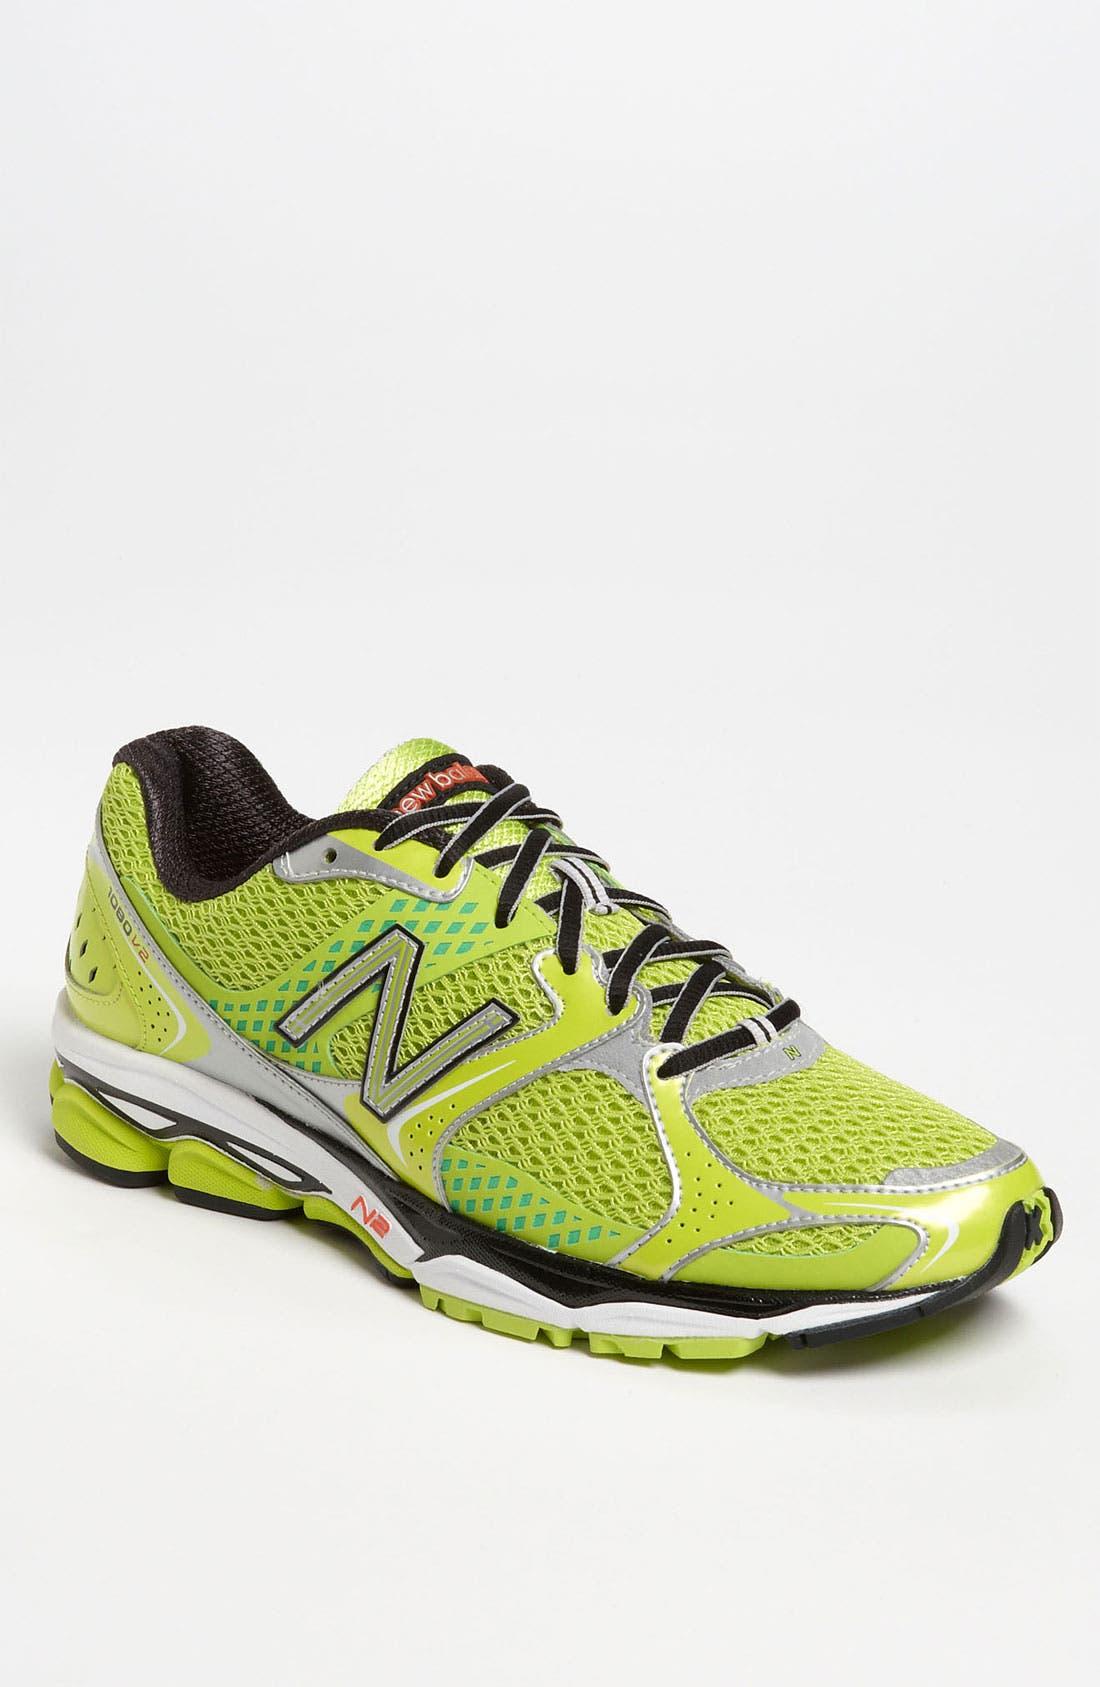 Alternate Image 1 Selected - New Balance '1080' Running Shoe (Men)